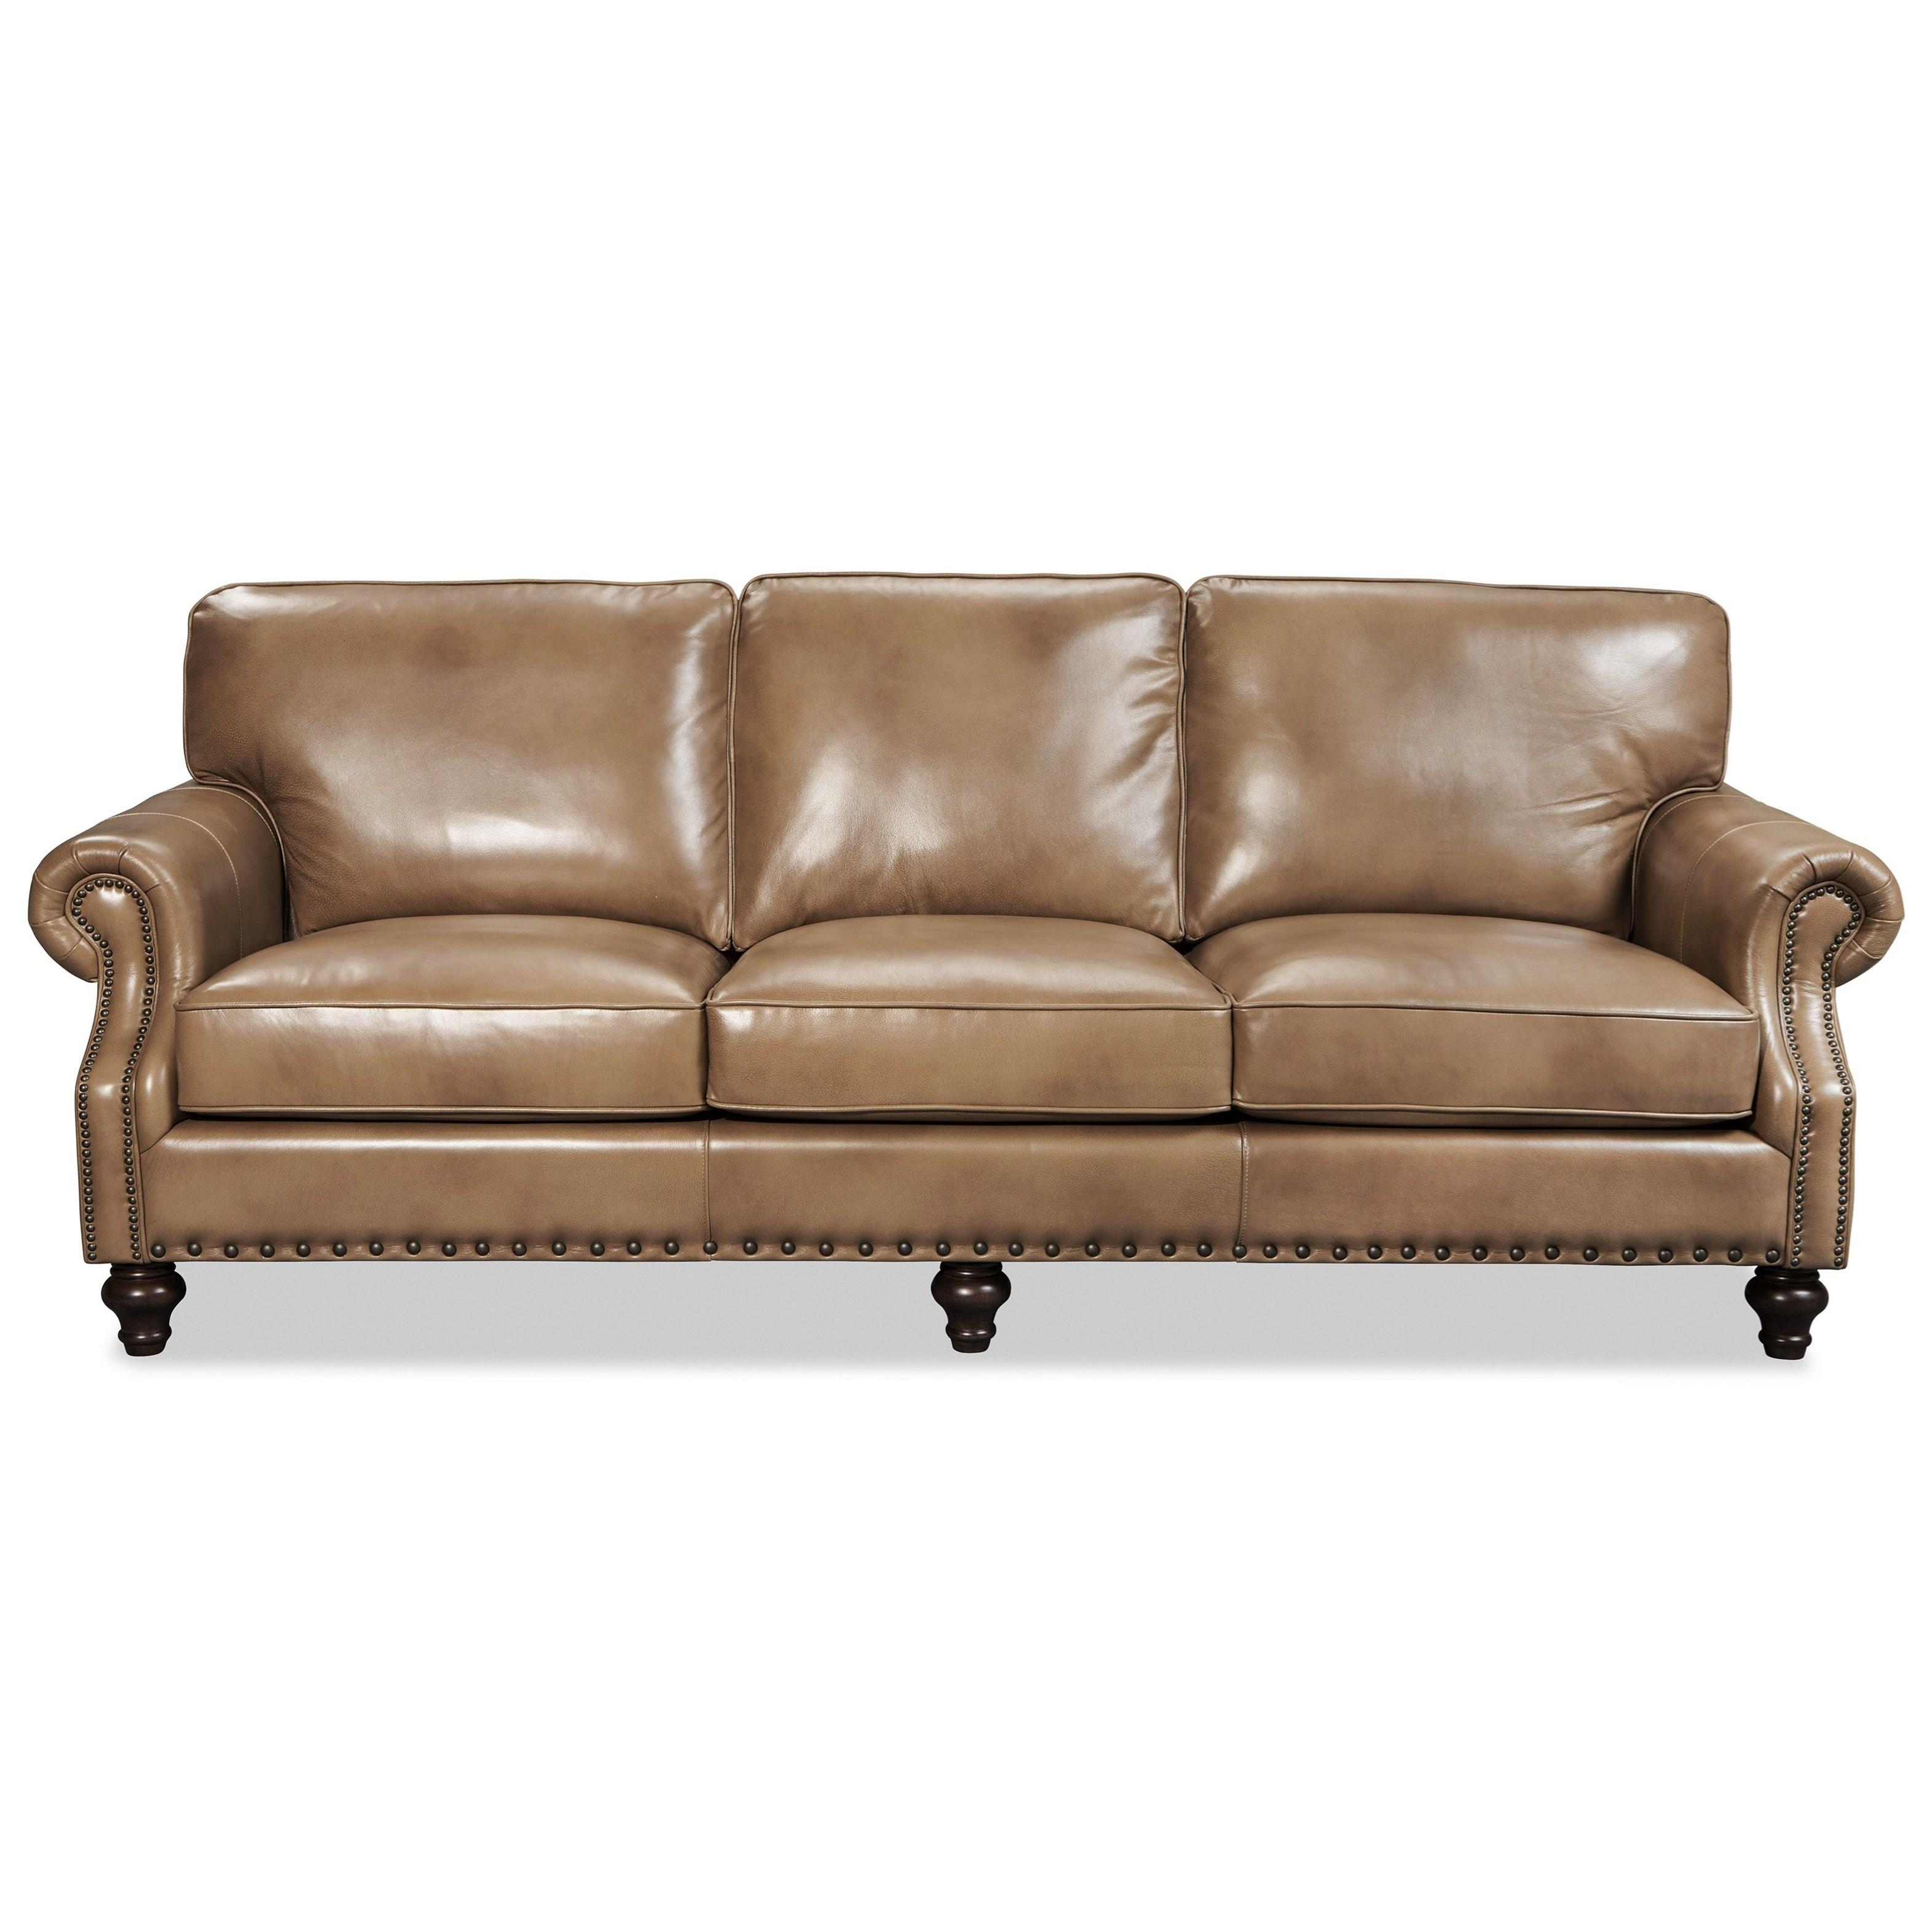 Craftmaster Eden 10 Craftmaster Traditonal Leather Sofa Boulevard Home Furnishings Sofas